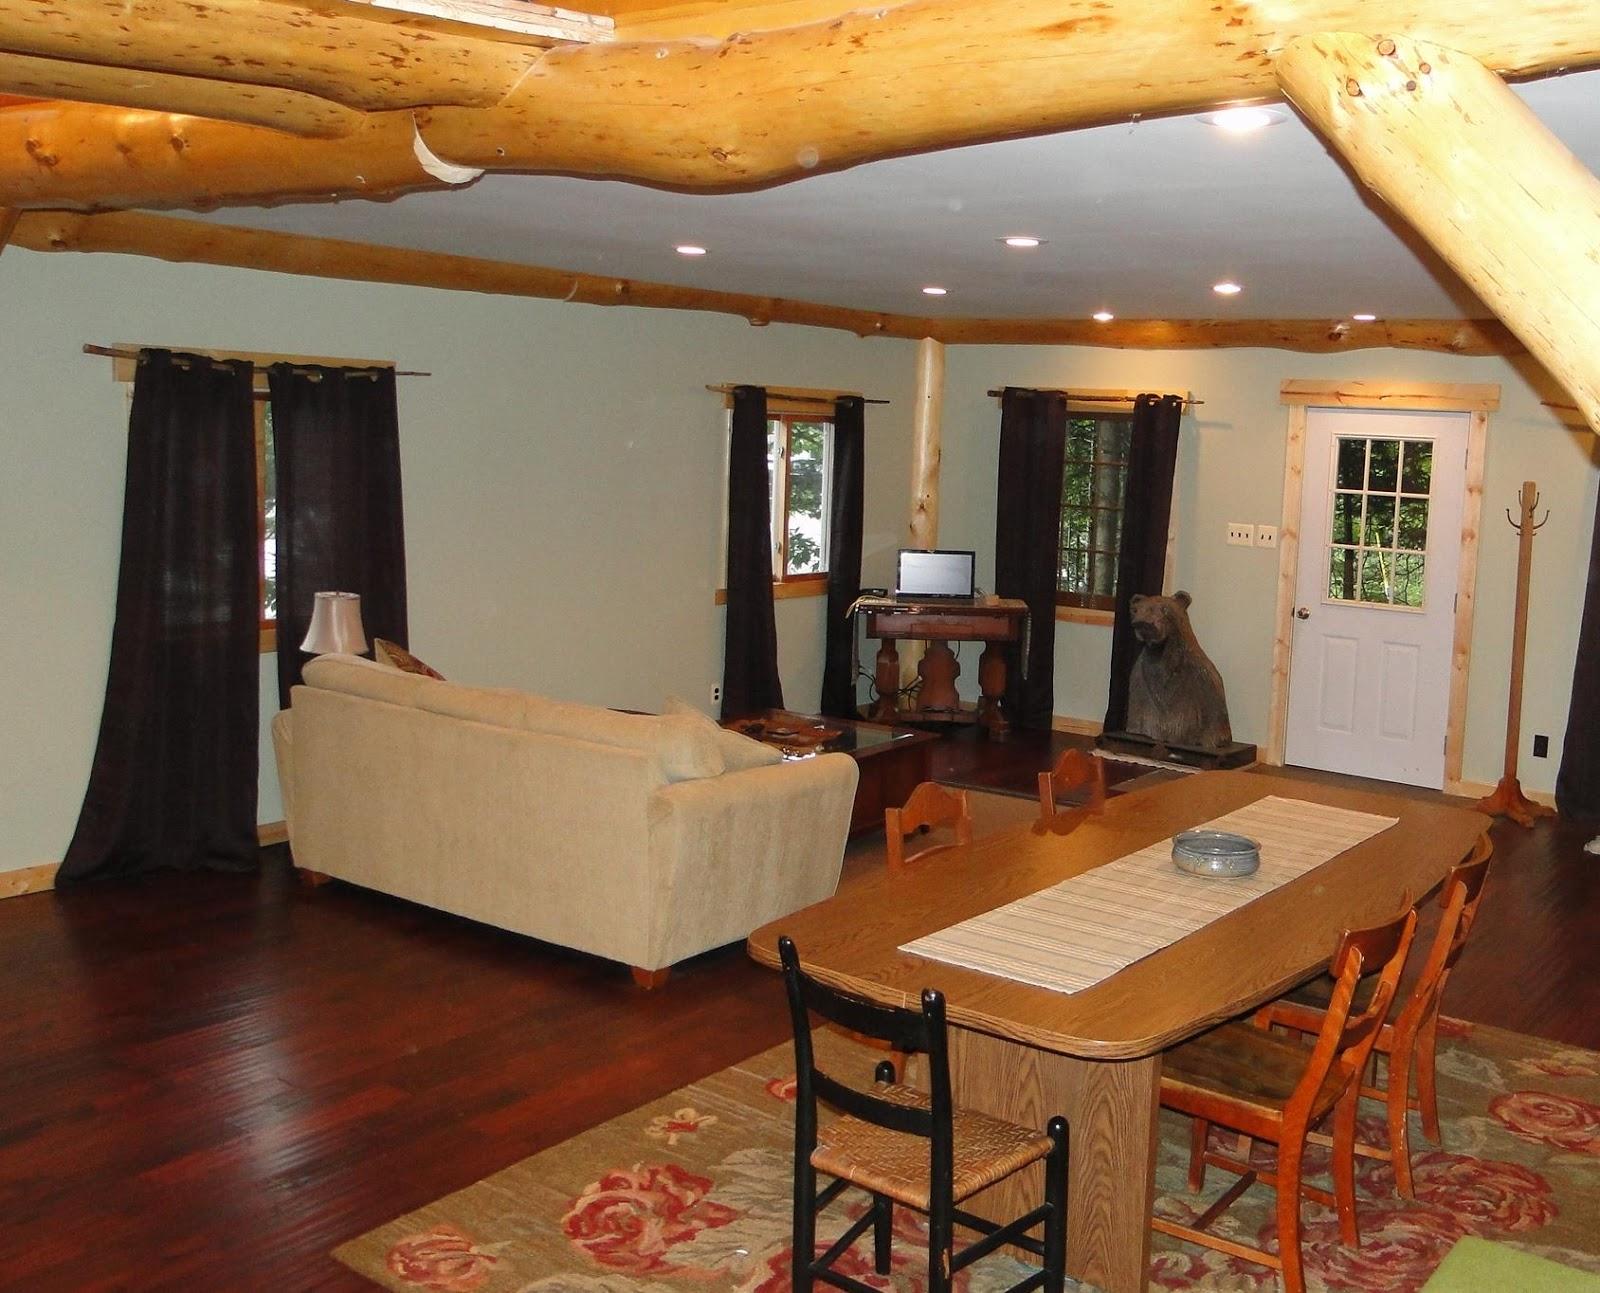 EagleBayCabin: Camp Imp  Adirondack Home 4 Rent